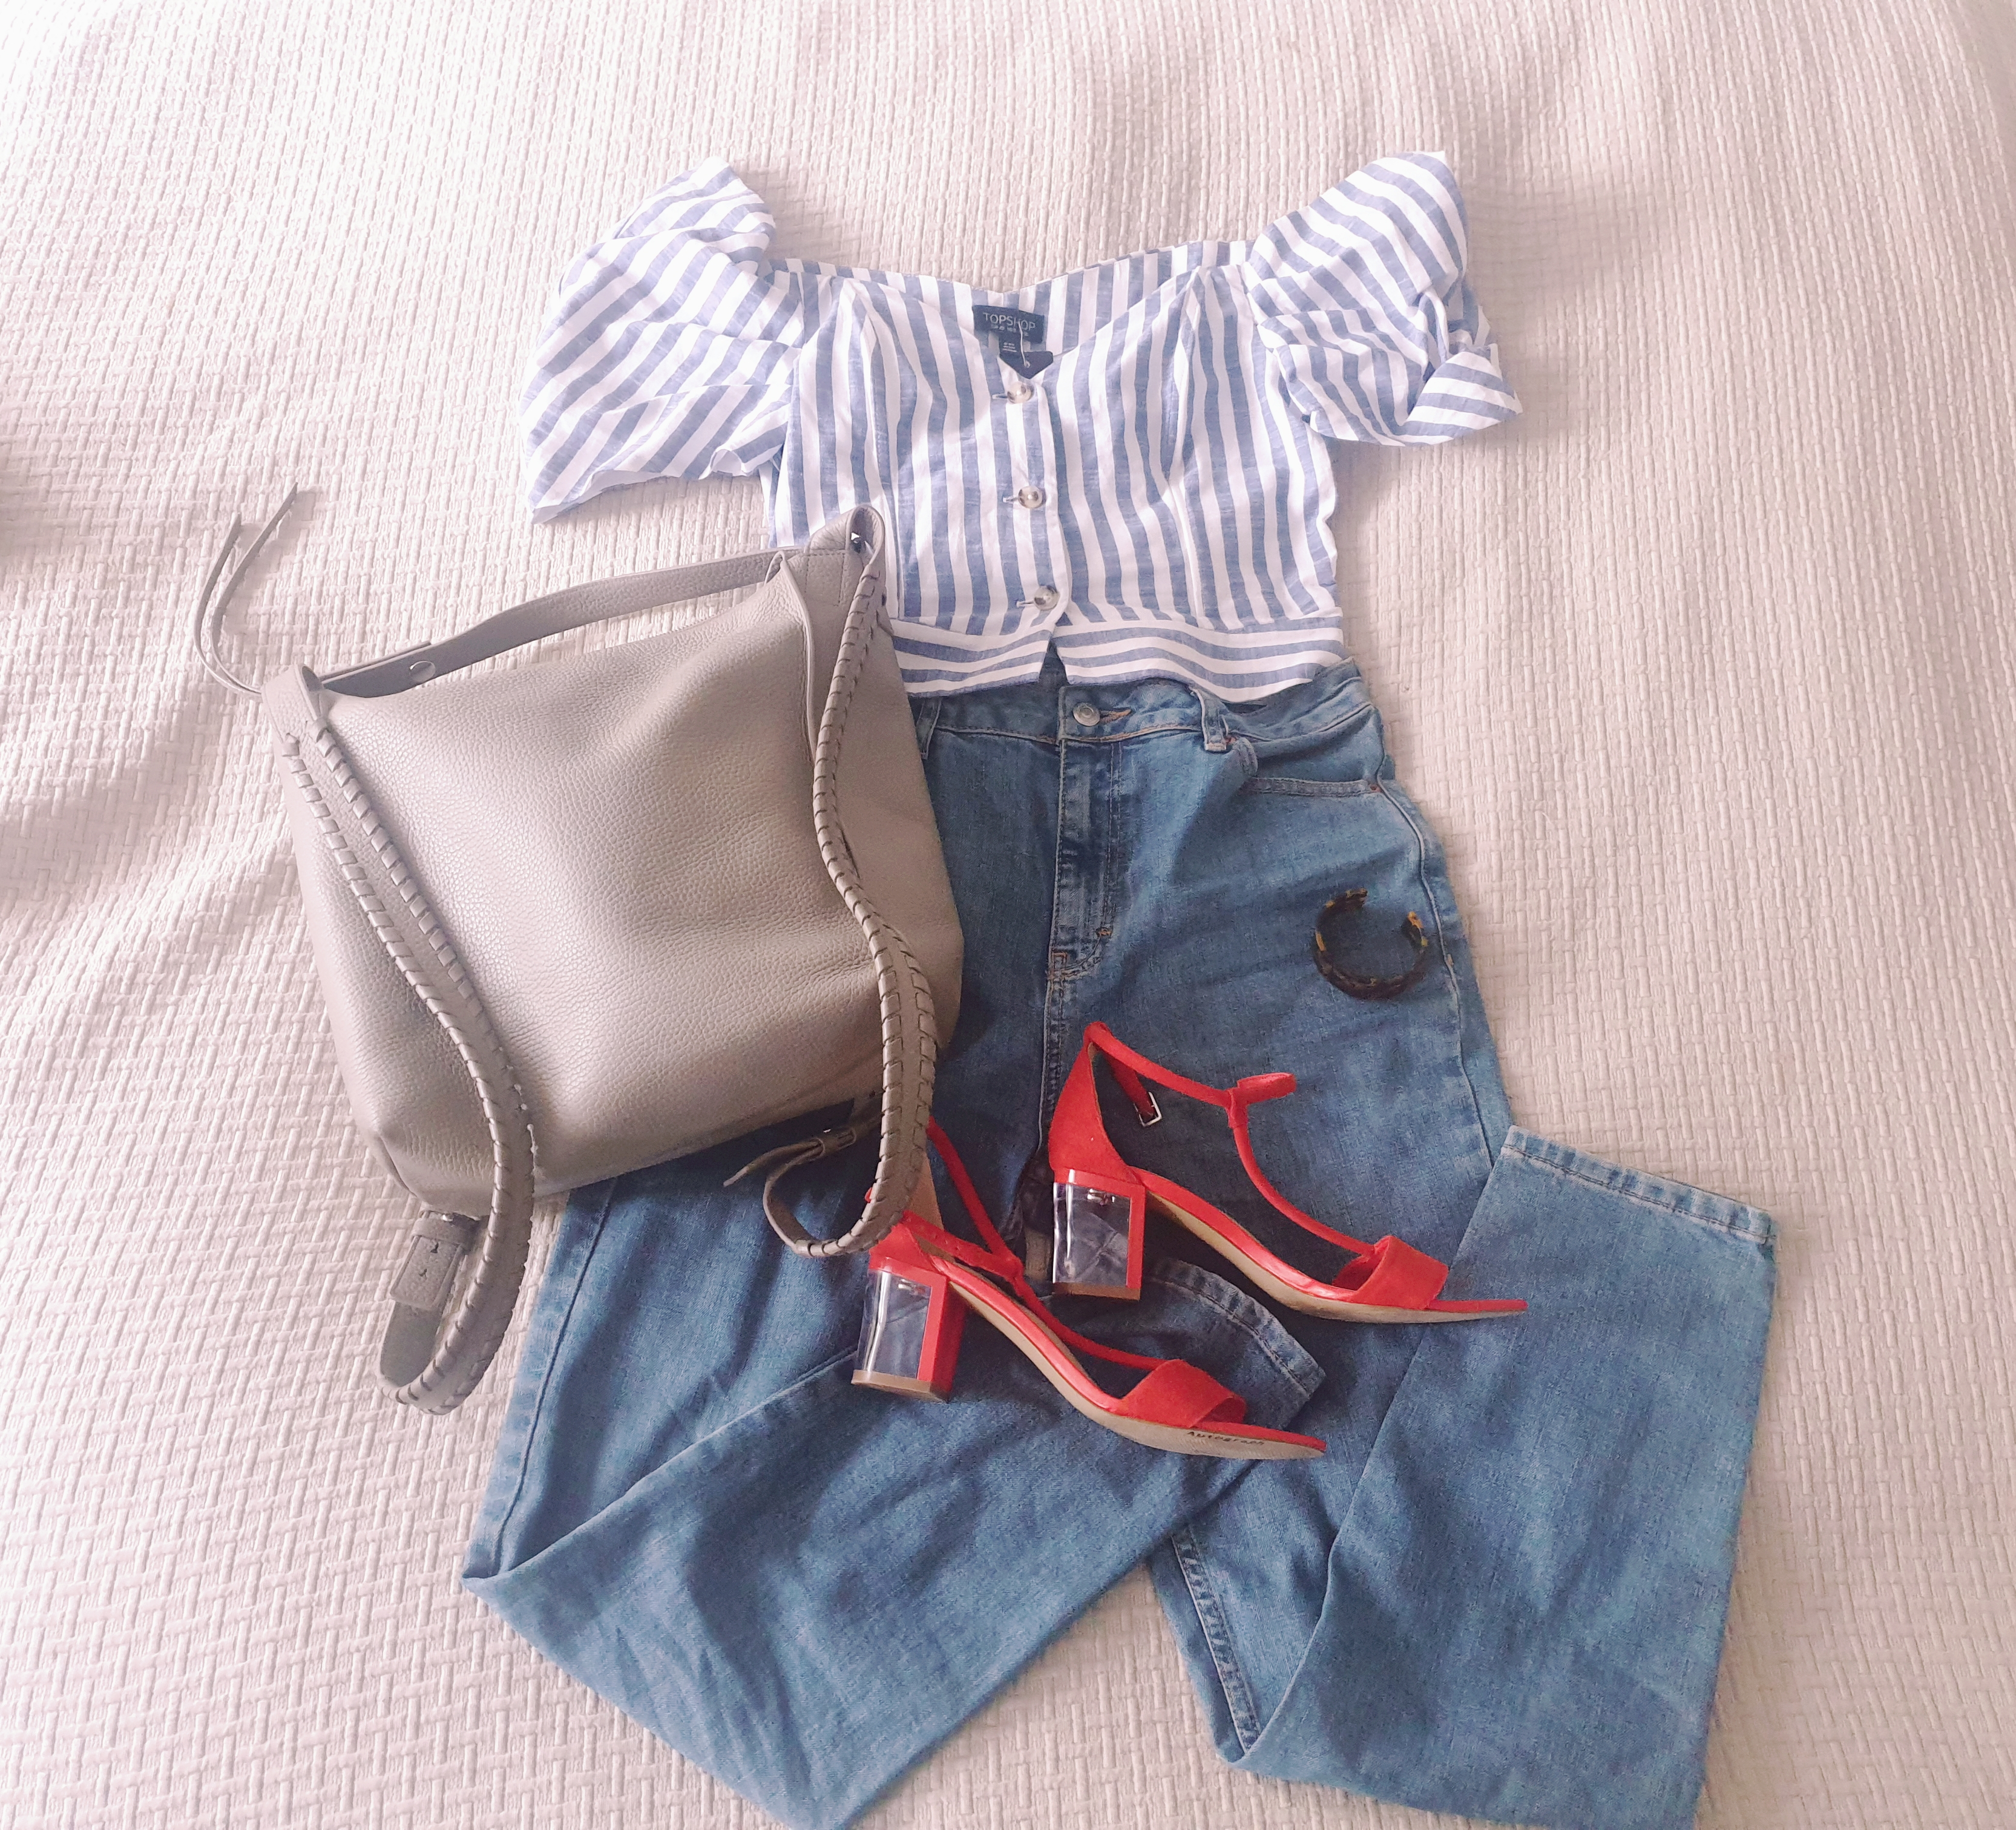 Topshop bardot top, Topshop Orson jeans, red perspex heel sandals, AllSaints Kita bag